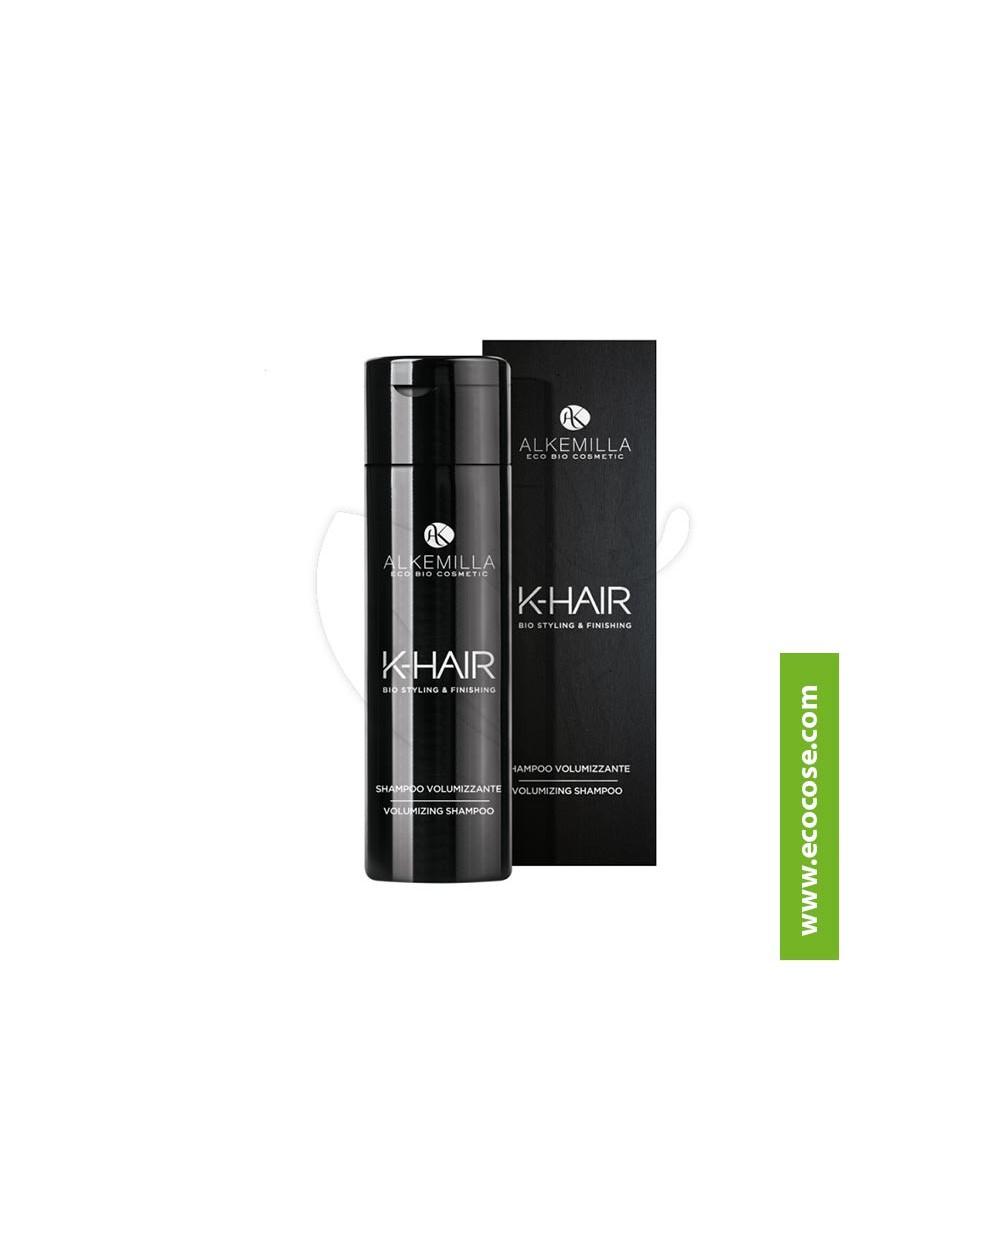 Alkemilla - K-HAIR - Shampoo Volumizzante